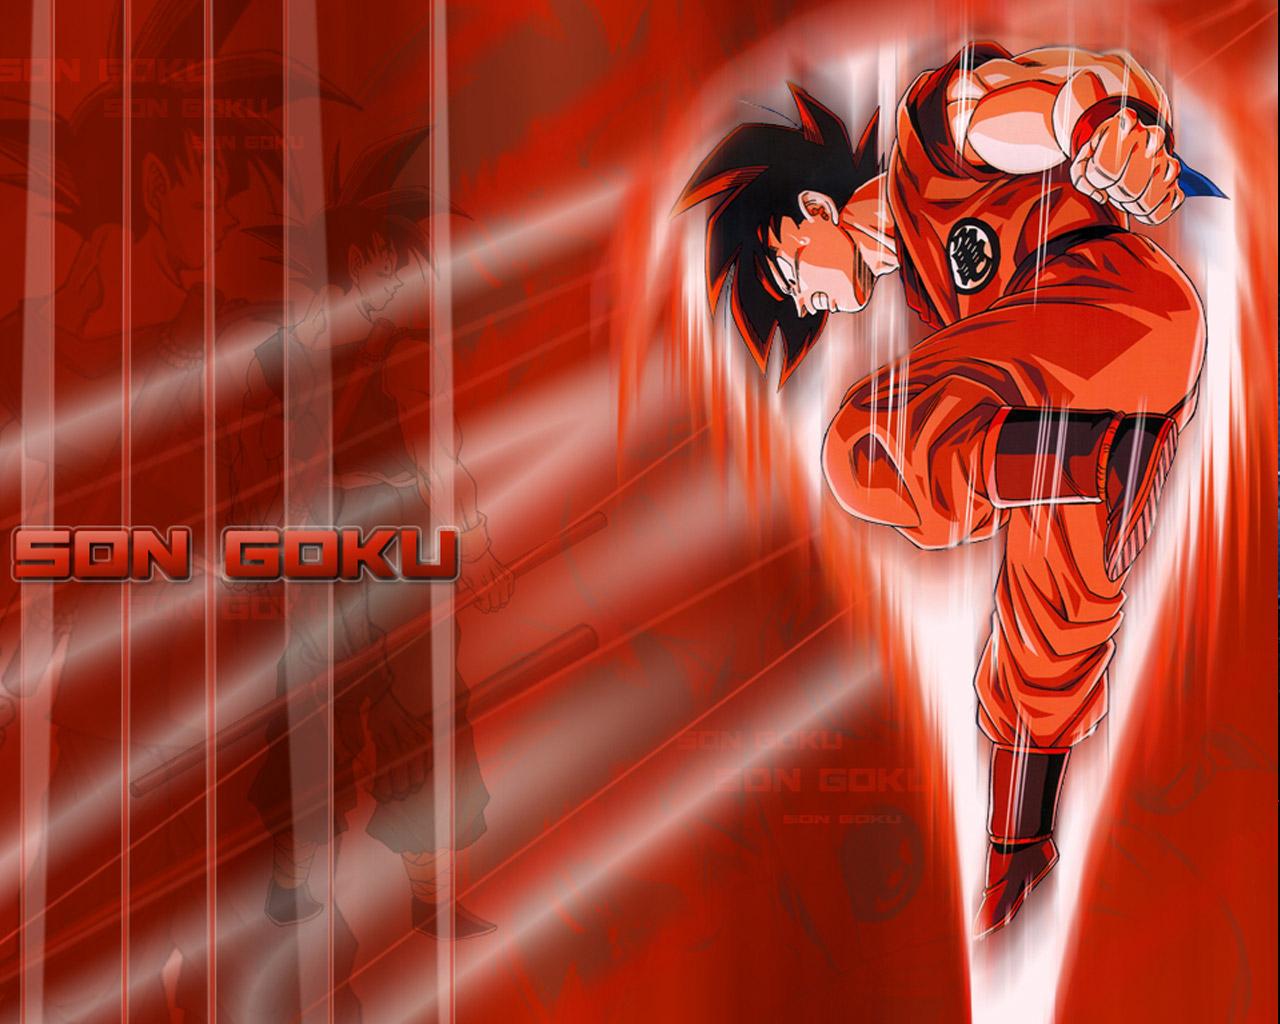 download Goku images Goku HD wallpaper and background photos 1280x1024